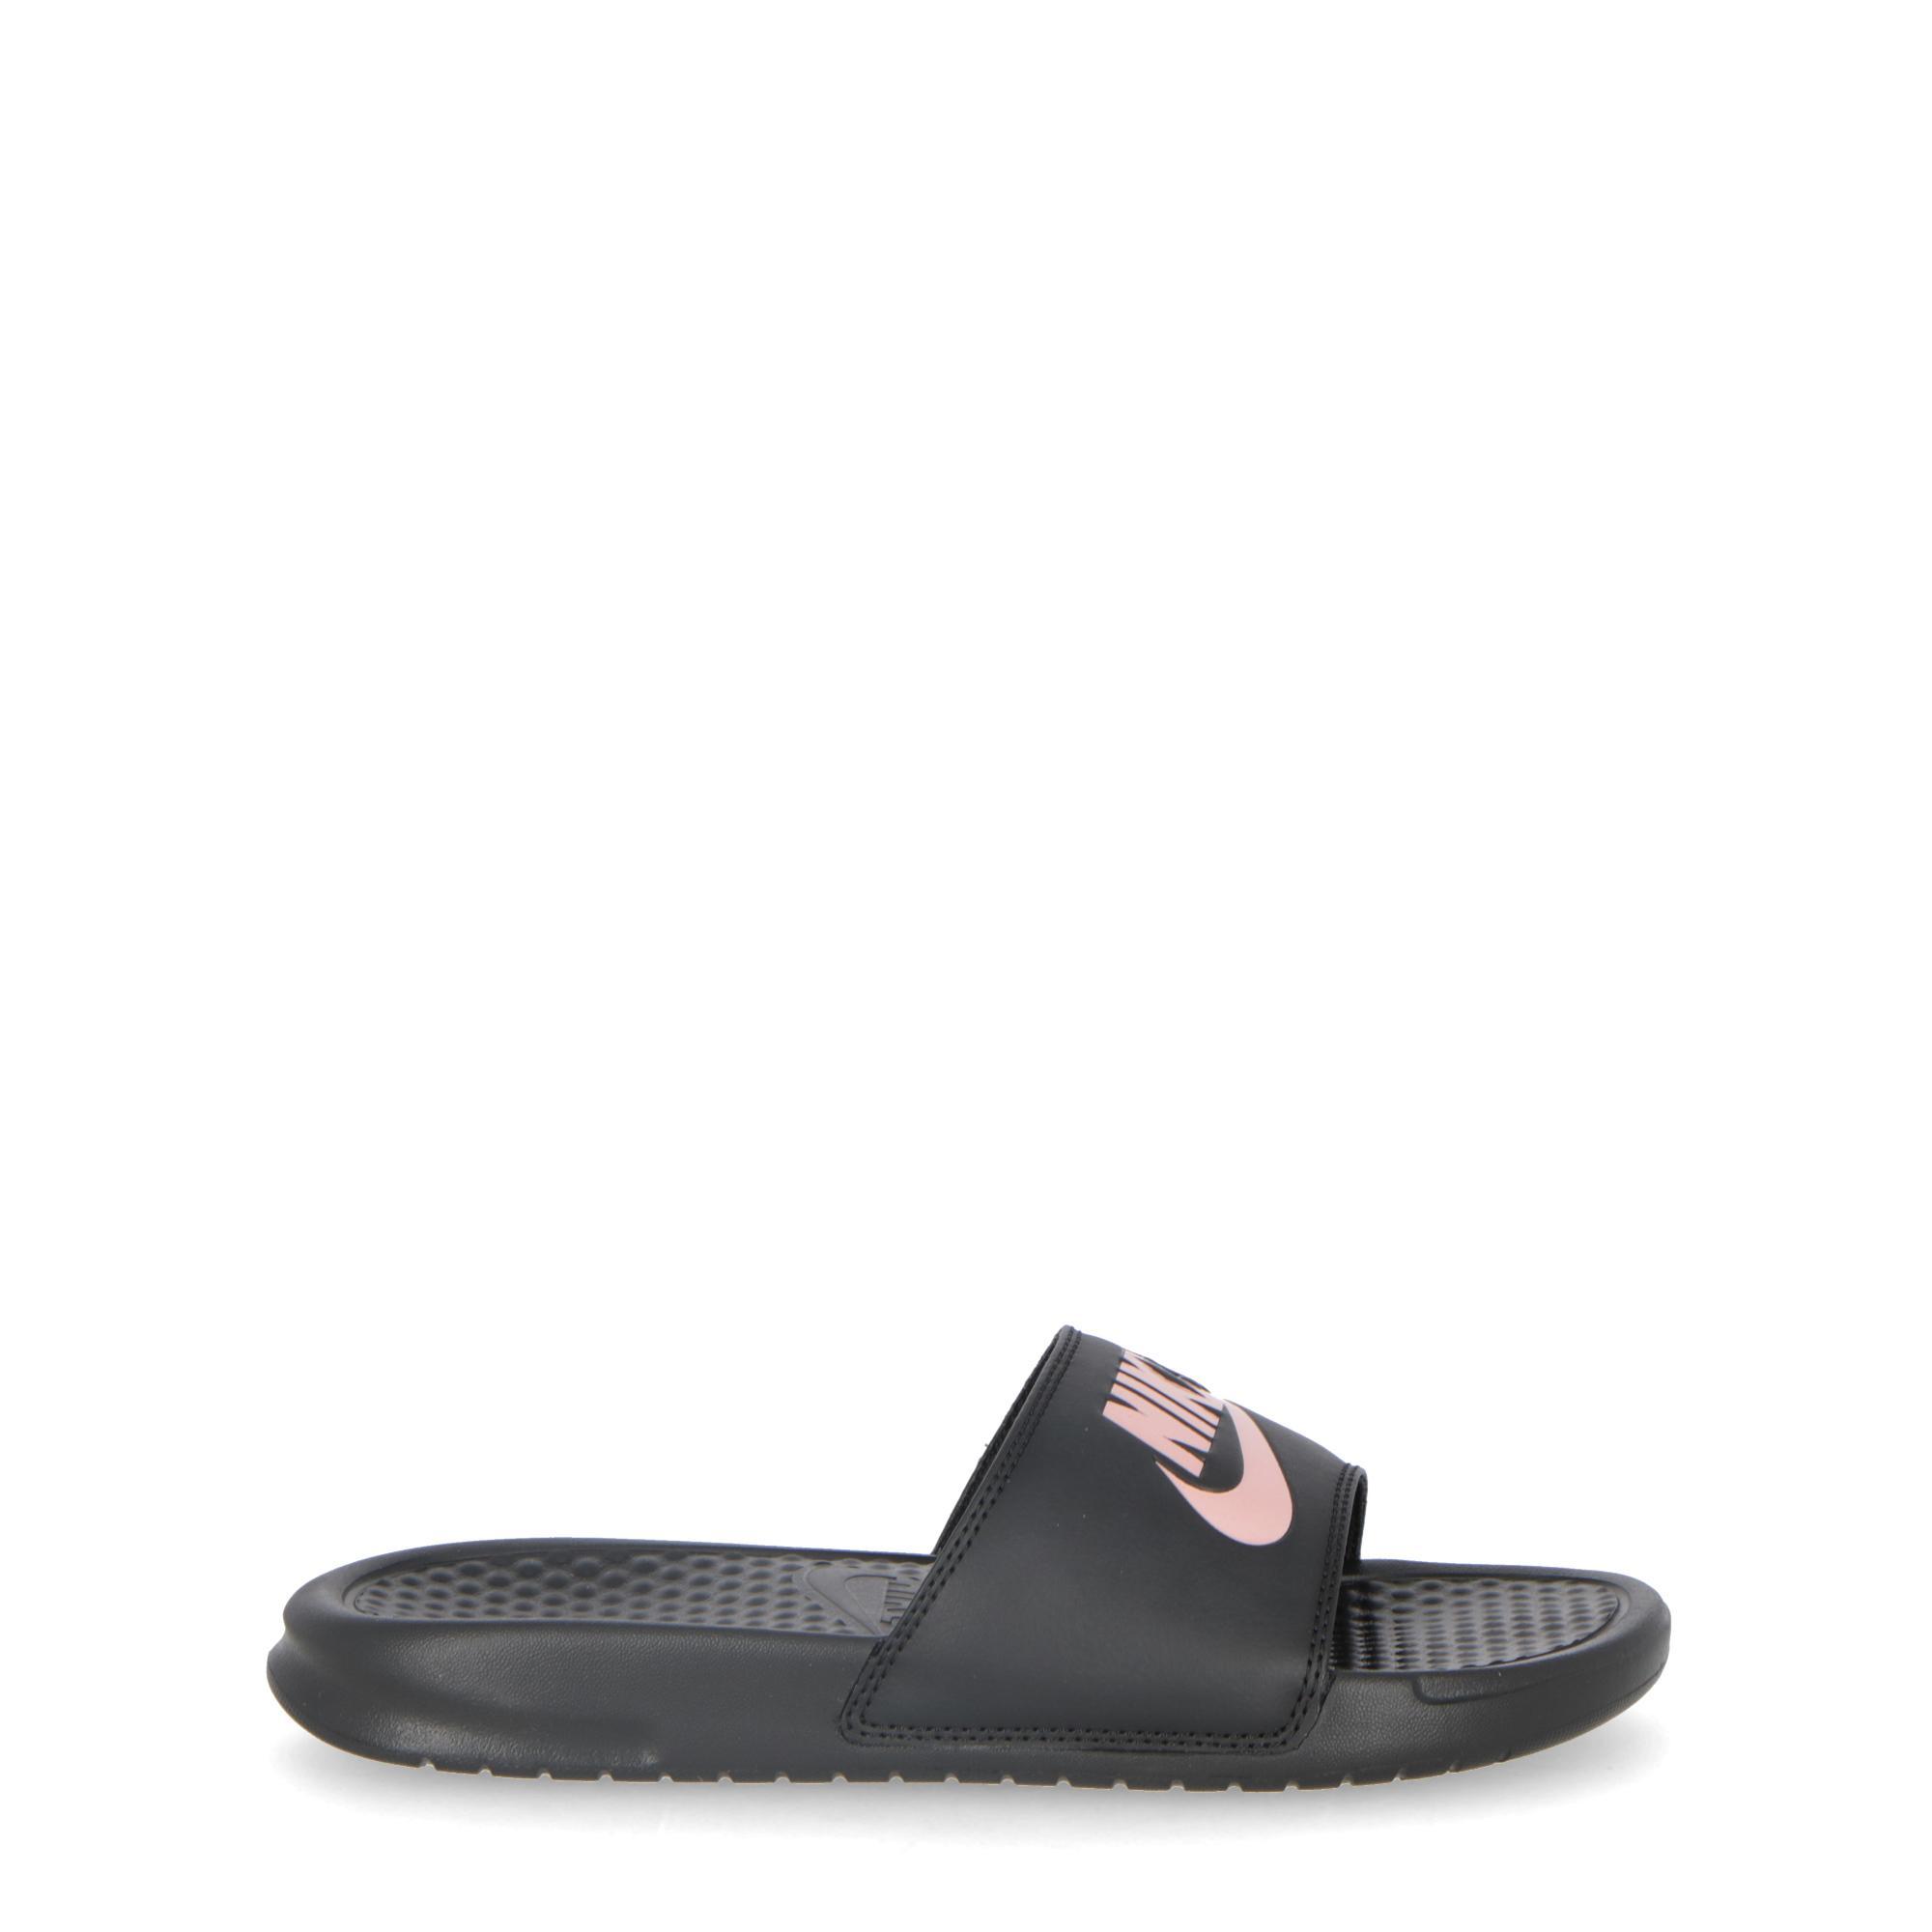 Nike W Benassi Jdi Black rosgld  03993e555377